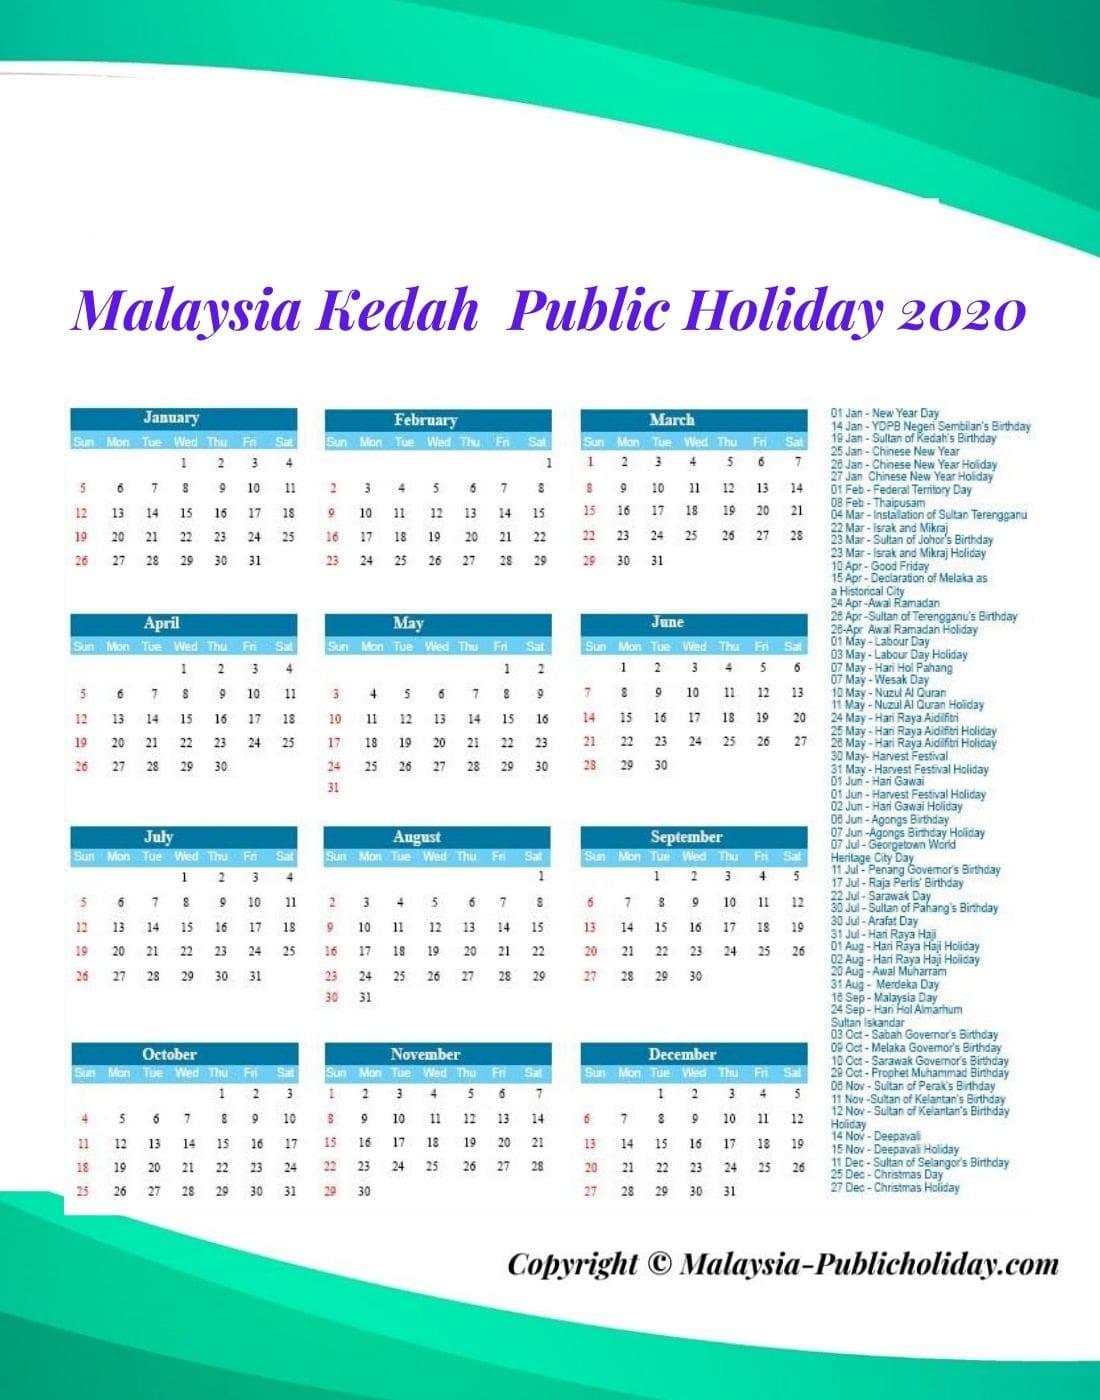 Kedah Public Holiday 2020